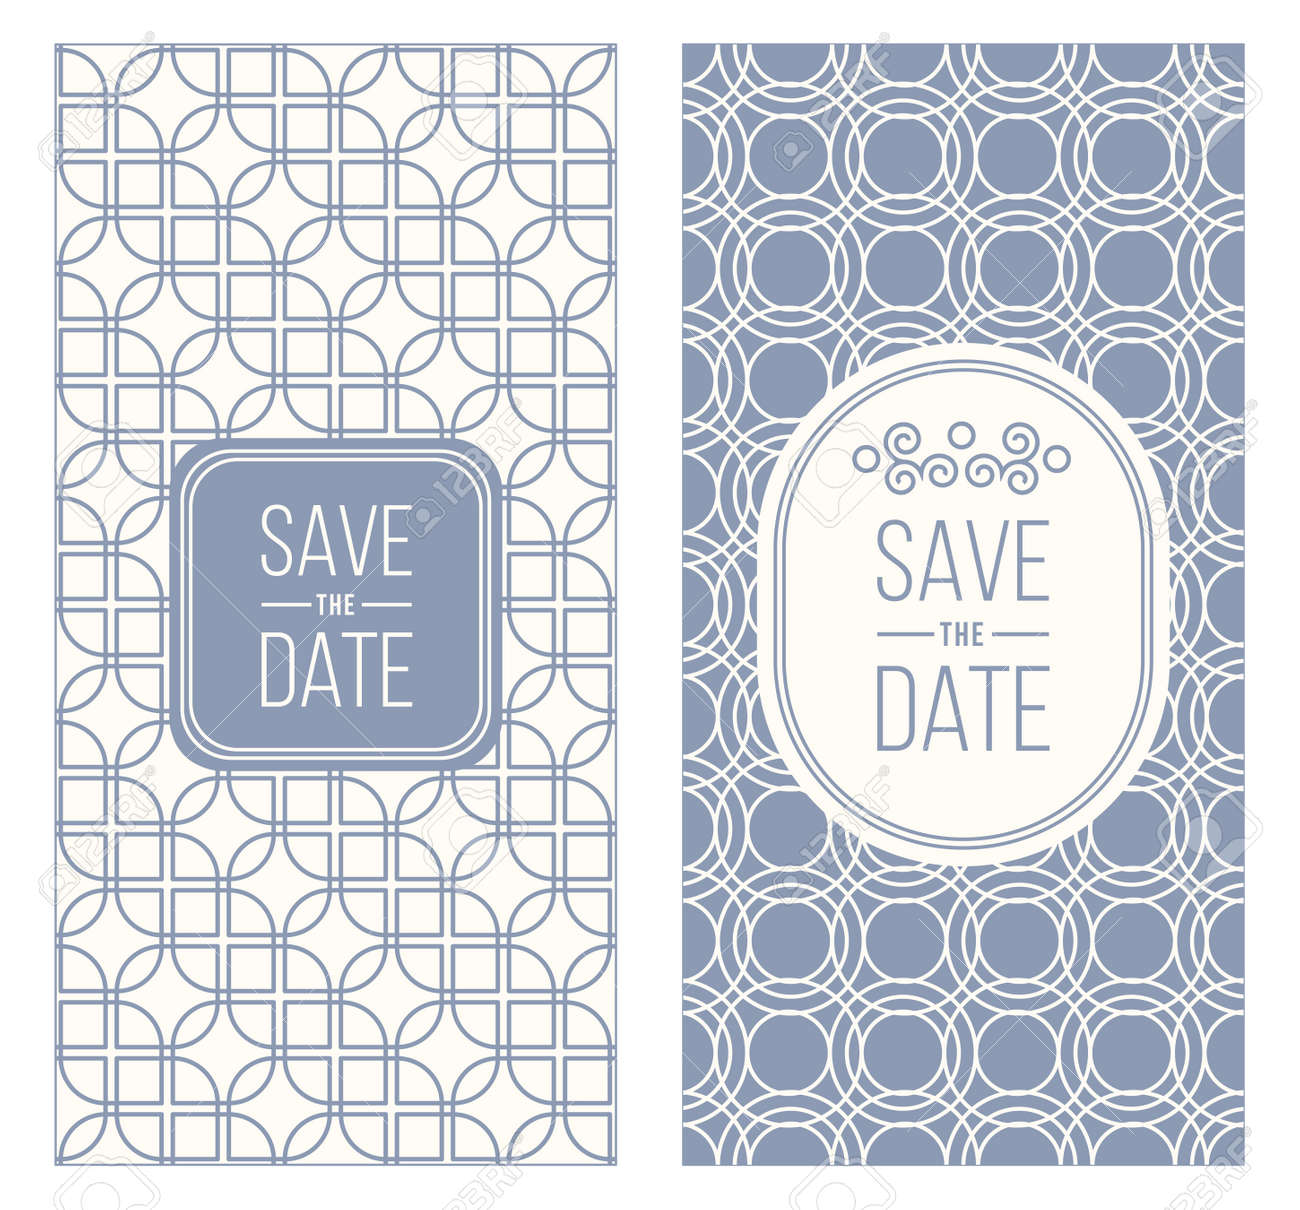 Two Retro Wedding Invitation Templates Abstract Geometric